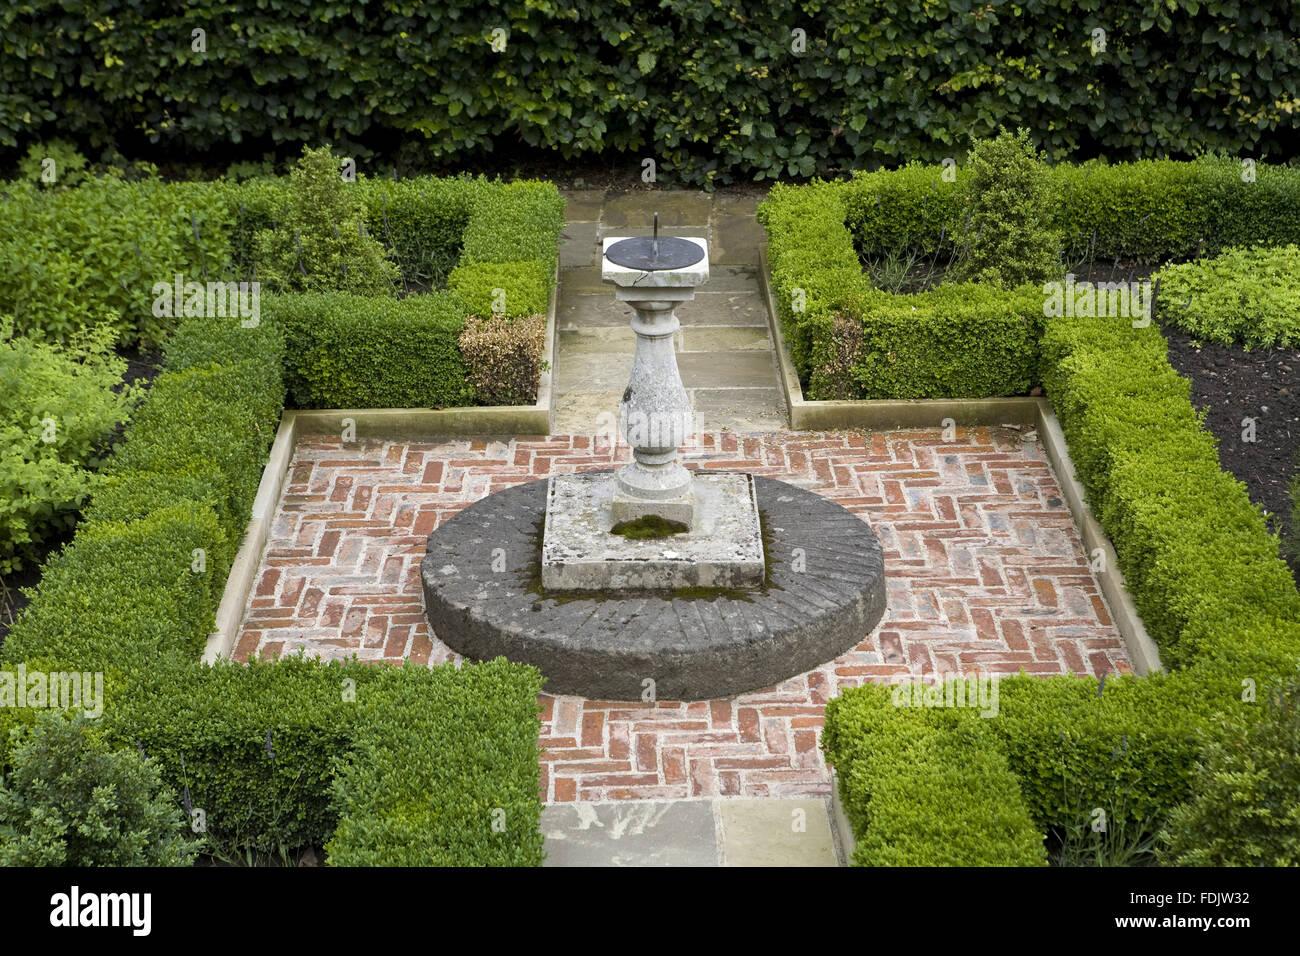 Merveilleux Sundial On A Plinth In The Garden At Washington Old Hall, Tyne U0026 Wear.